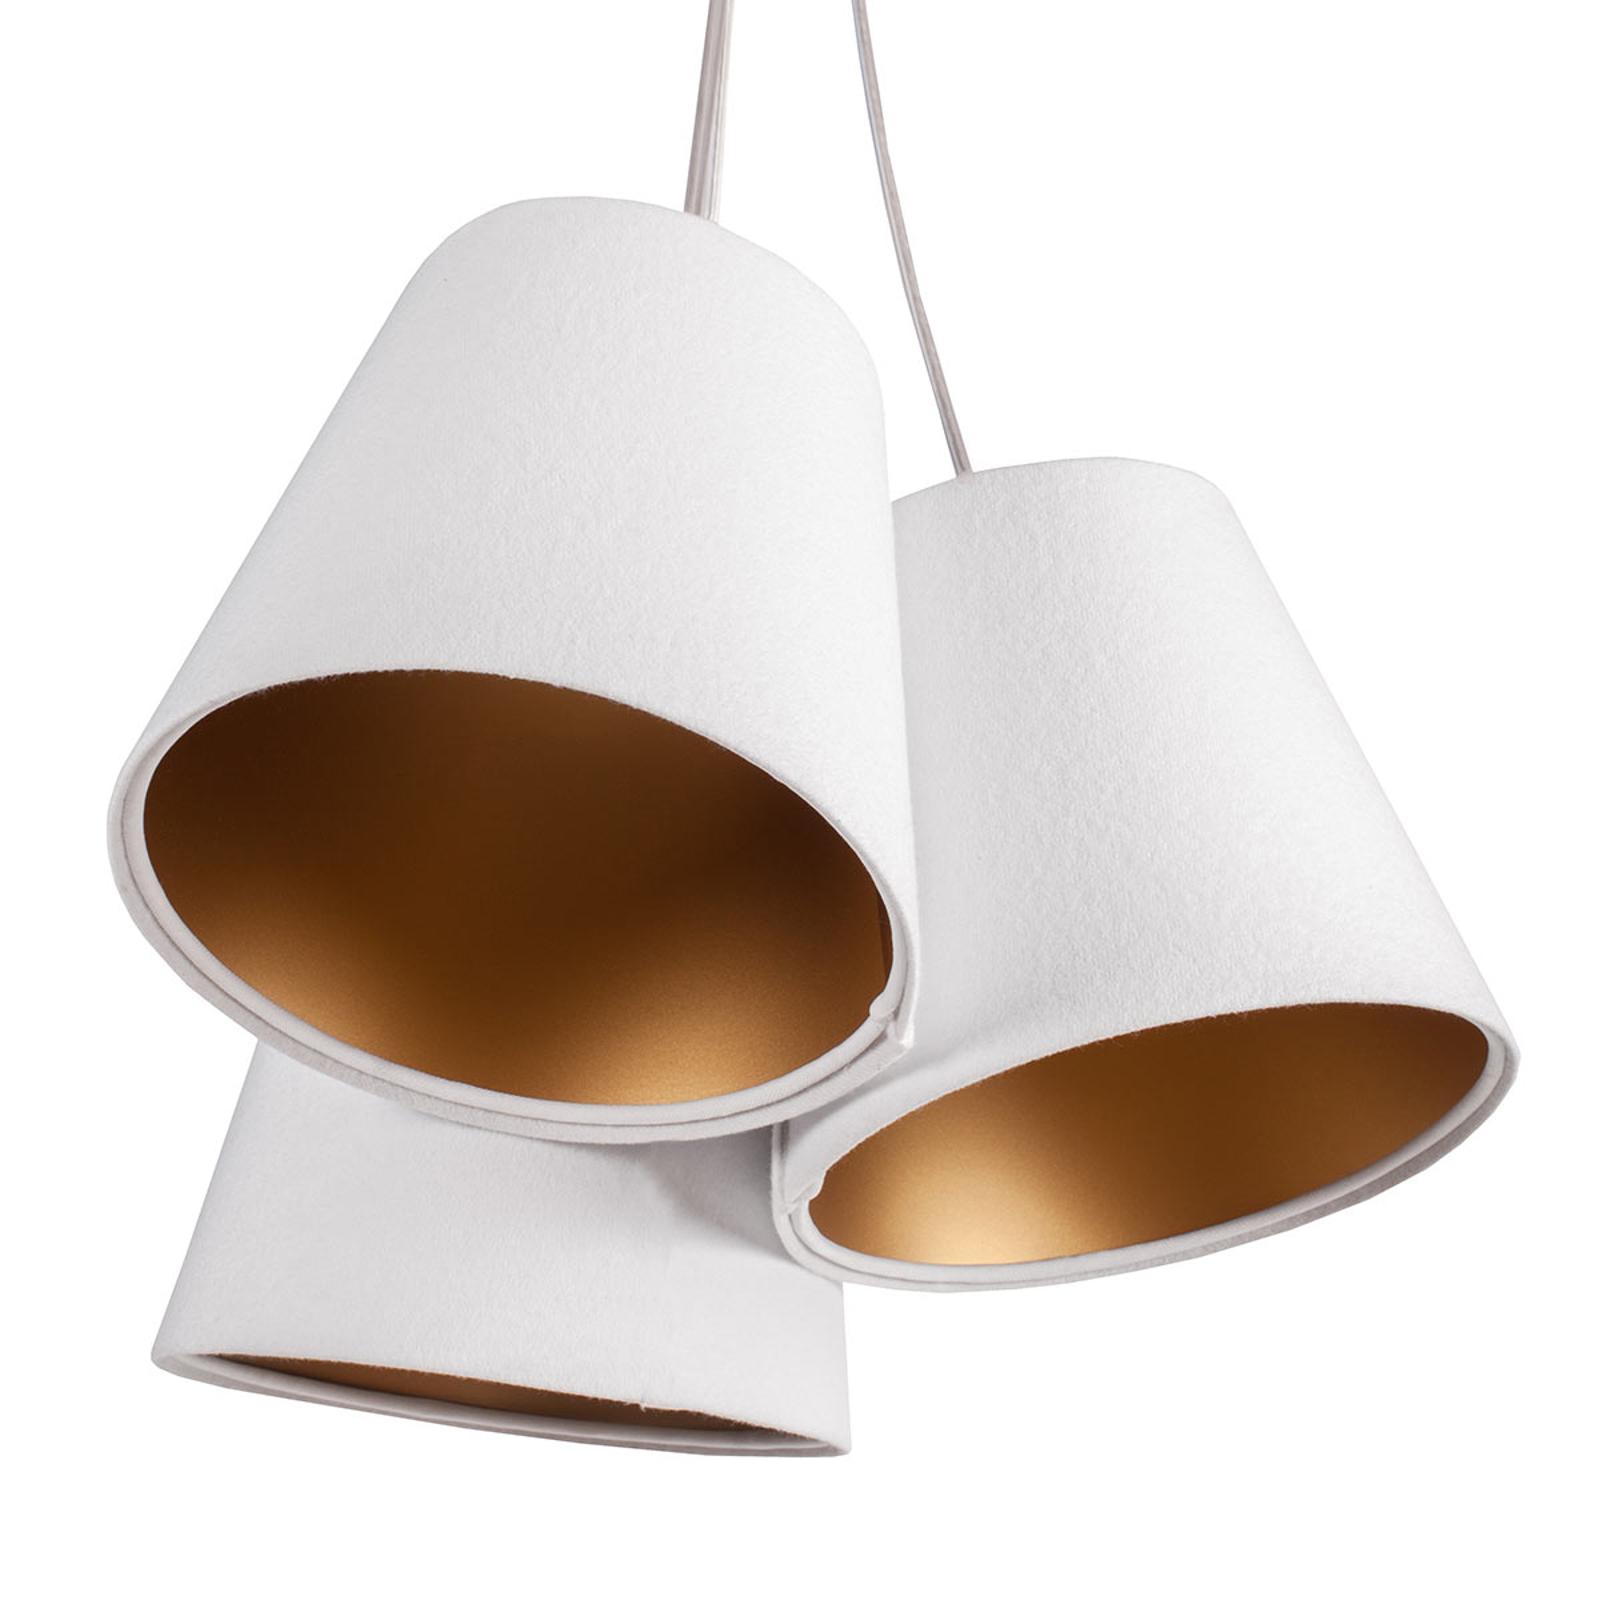 Riippuvalo Ambrozja 3-lamp. 2-värisin varjostimin